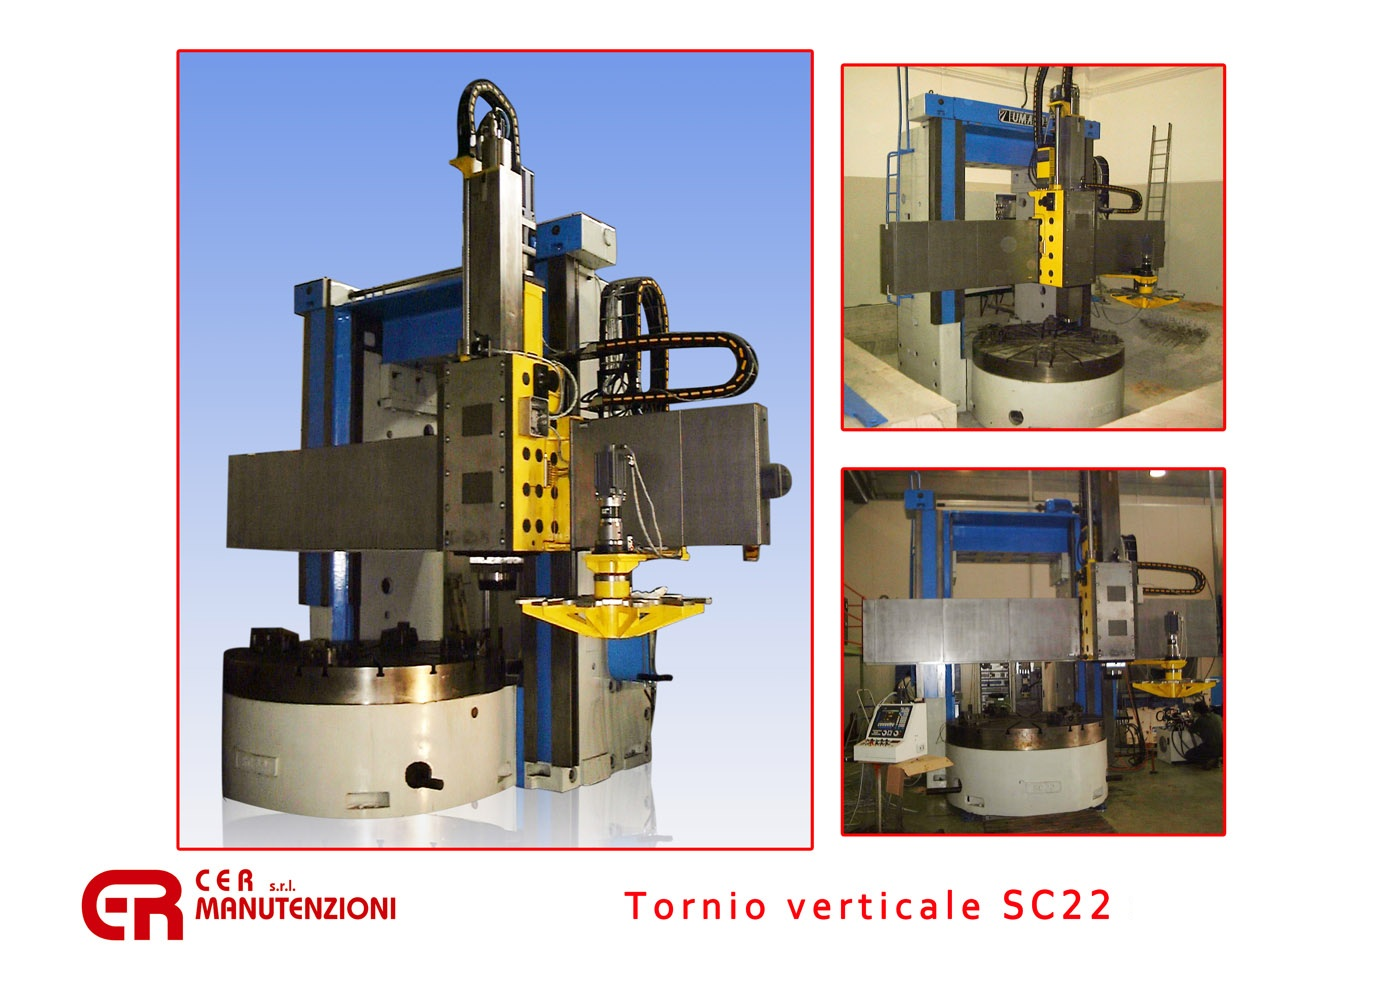 Tornio verticale SC22